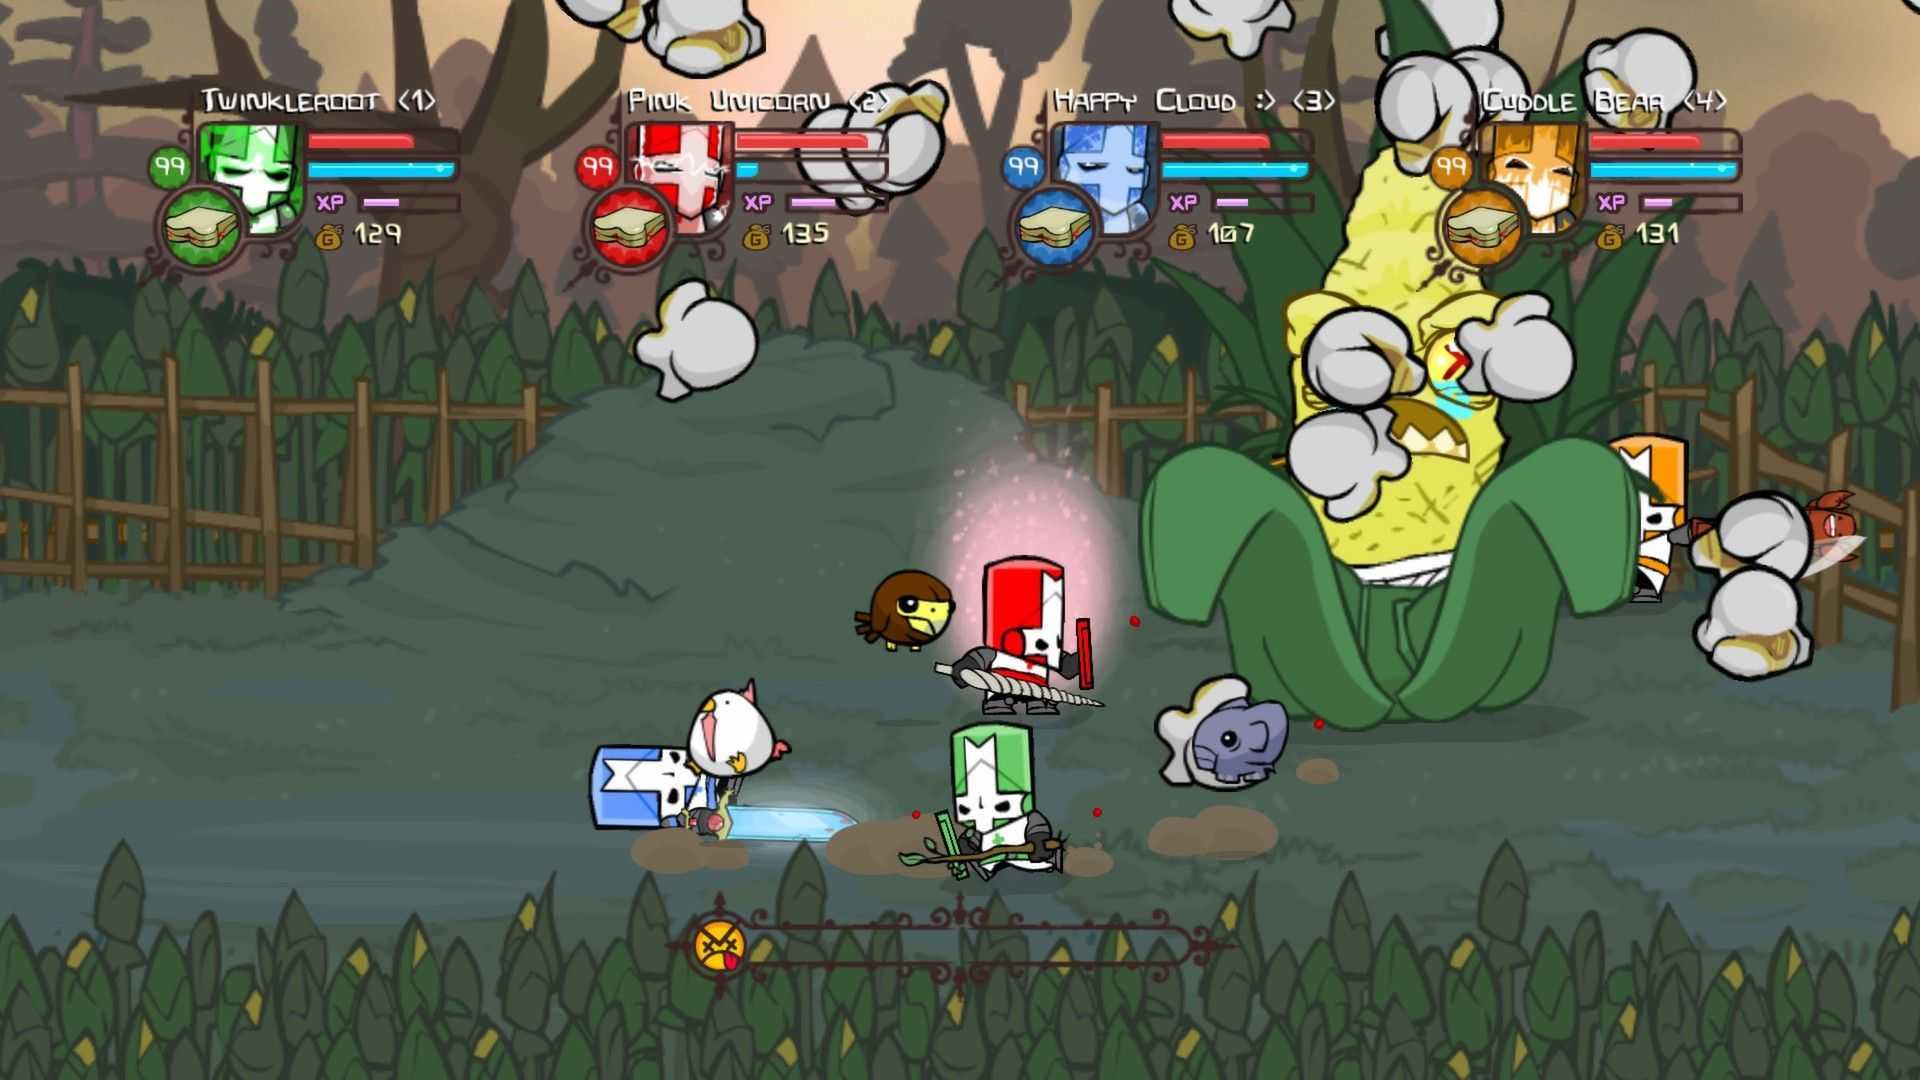 Castle Crashers Indie Game Castle Crashers Game Level Design Game Reviews